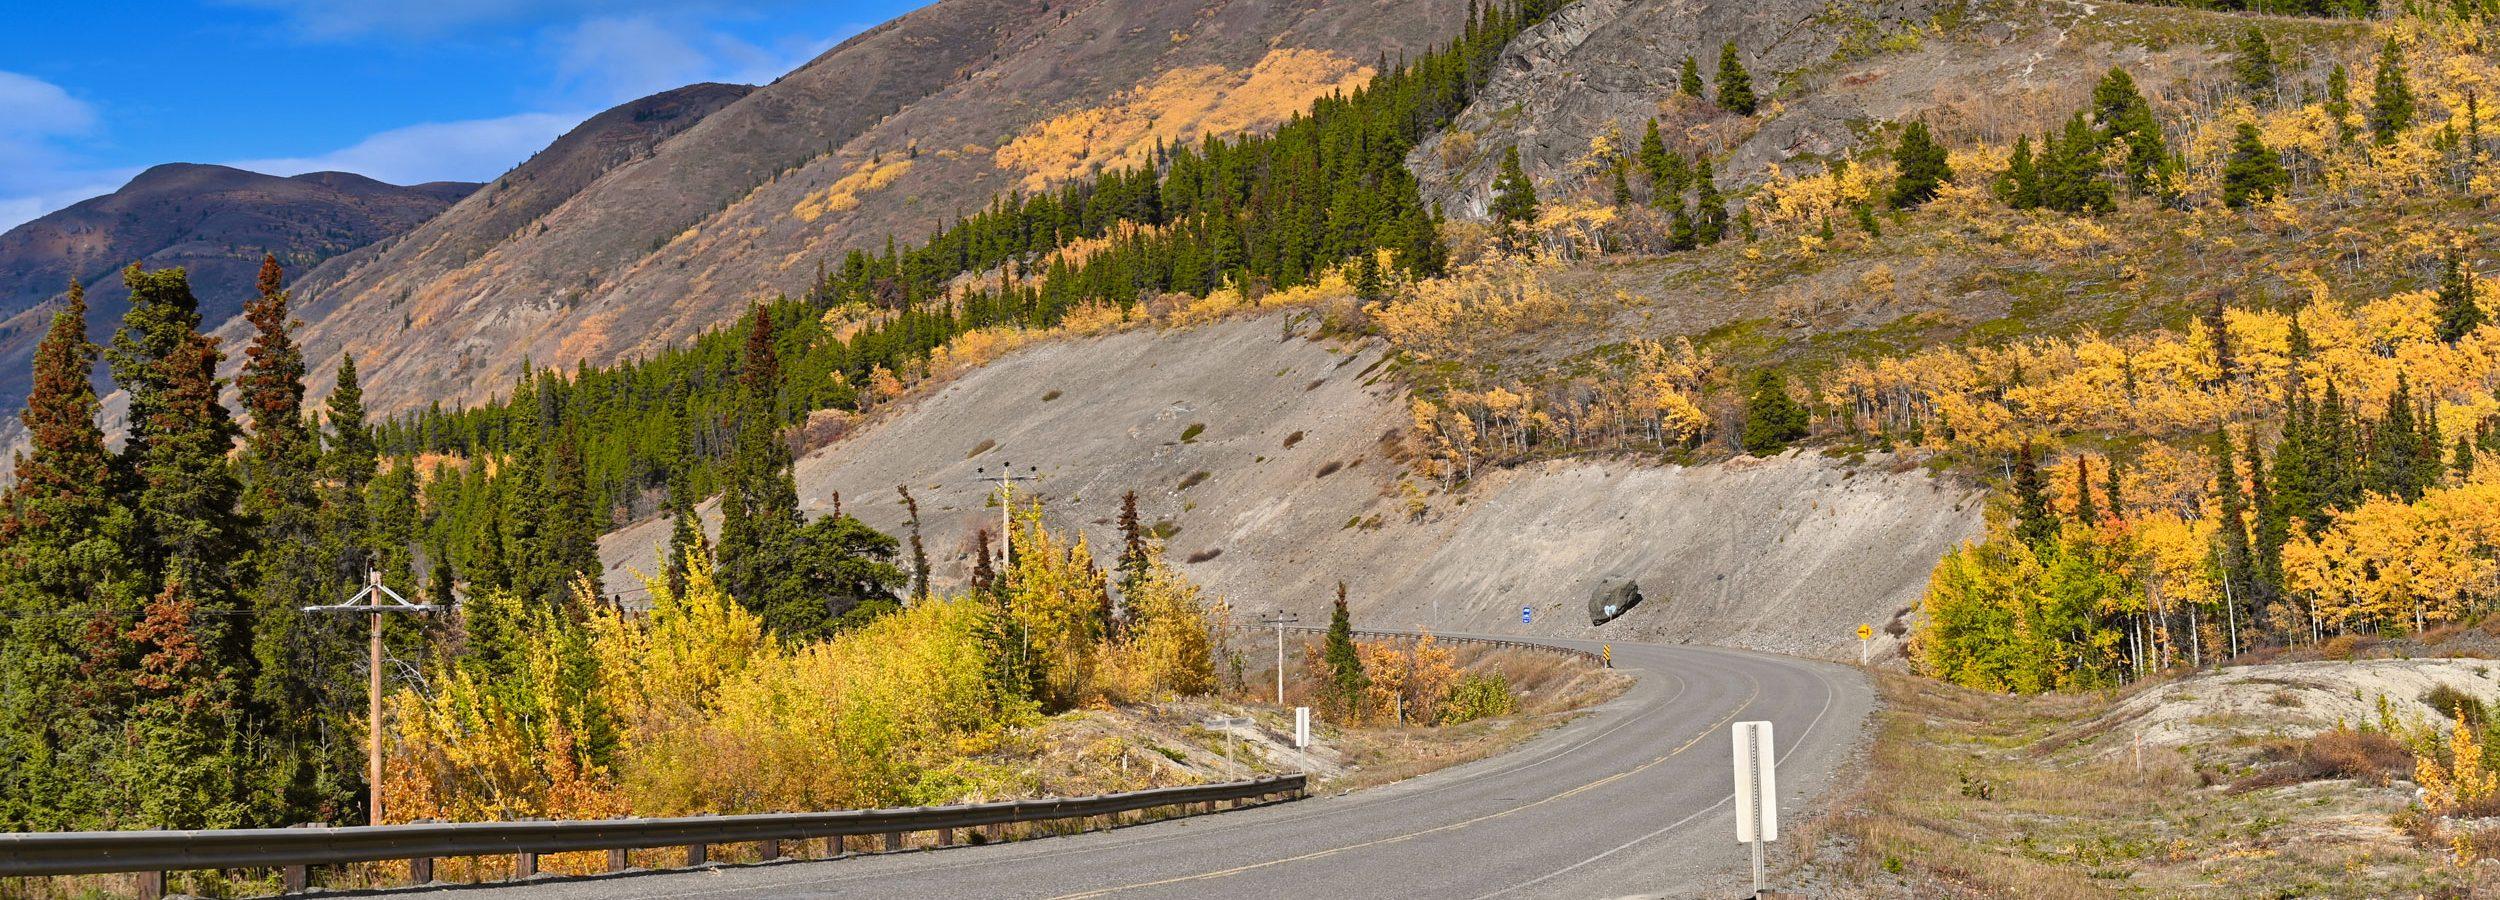 Klondike Highway, Kanada